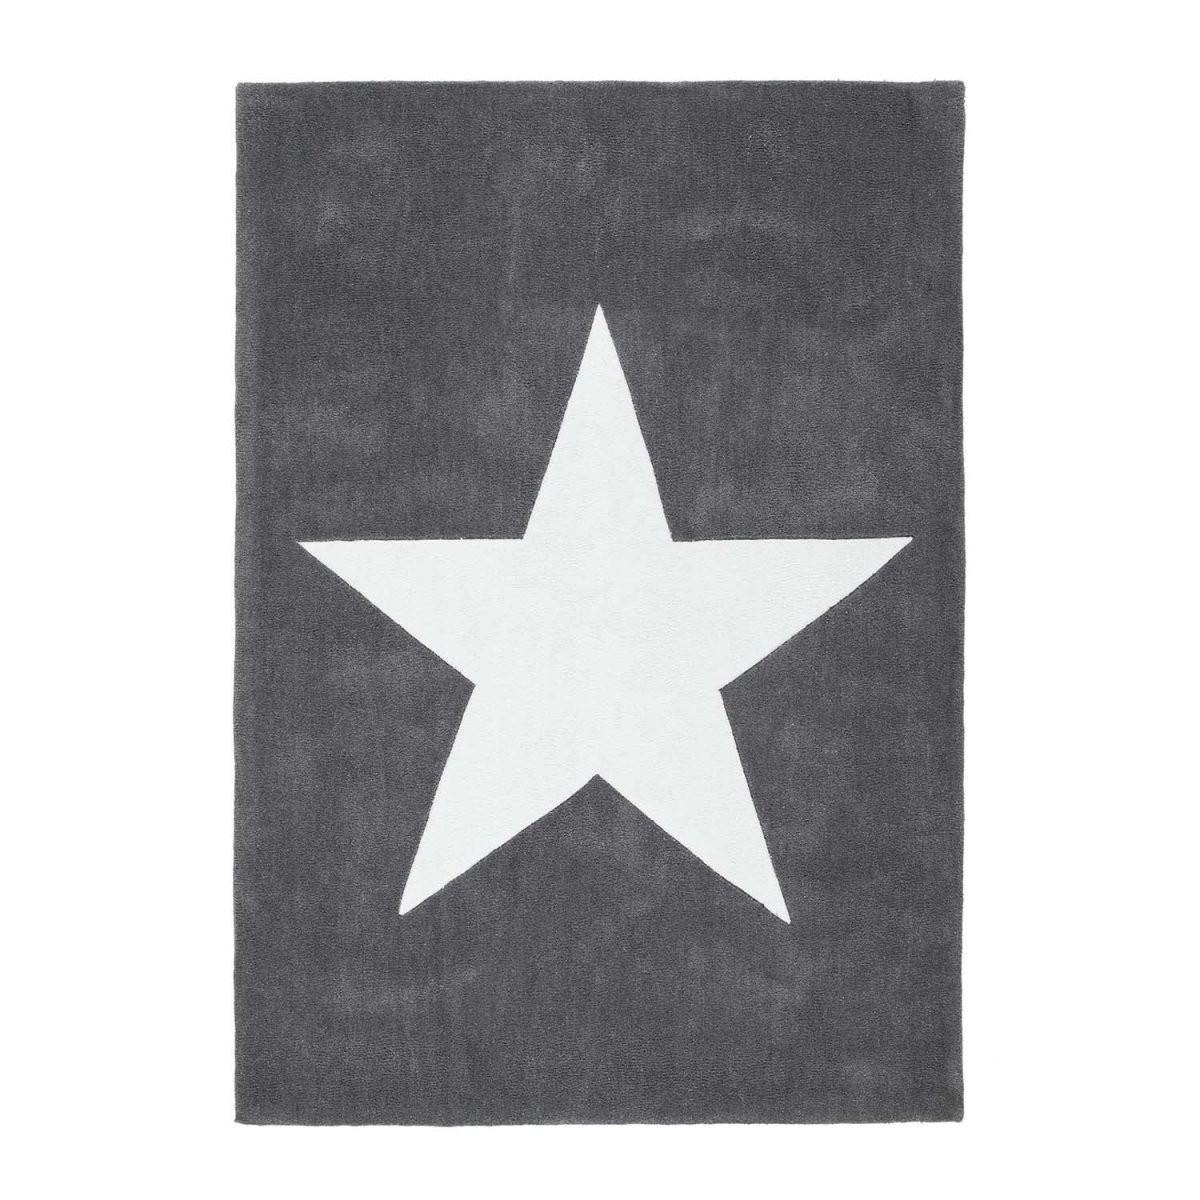 Jugendteppich Mit Stern  Yildiz Grau  Sternenteppich Flachflor von Teppich Mit Sternen Grau Bild